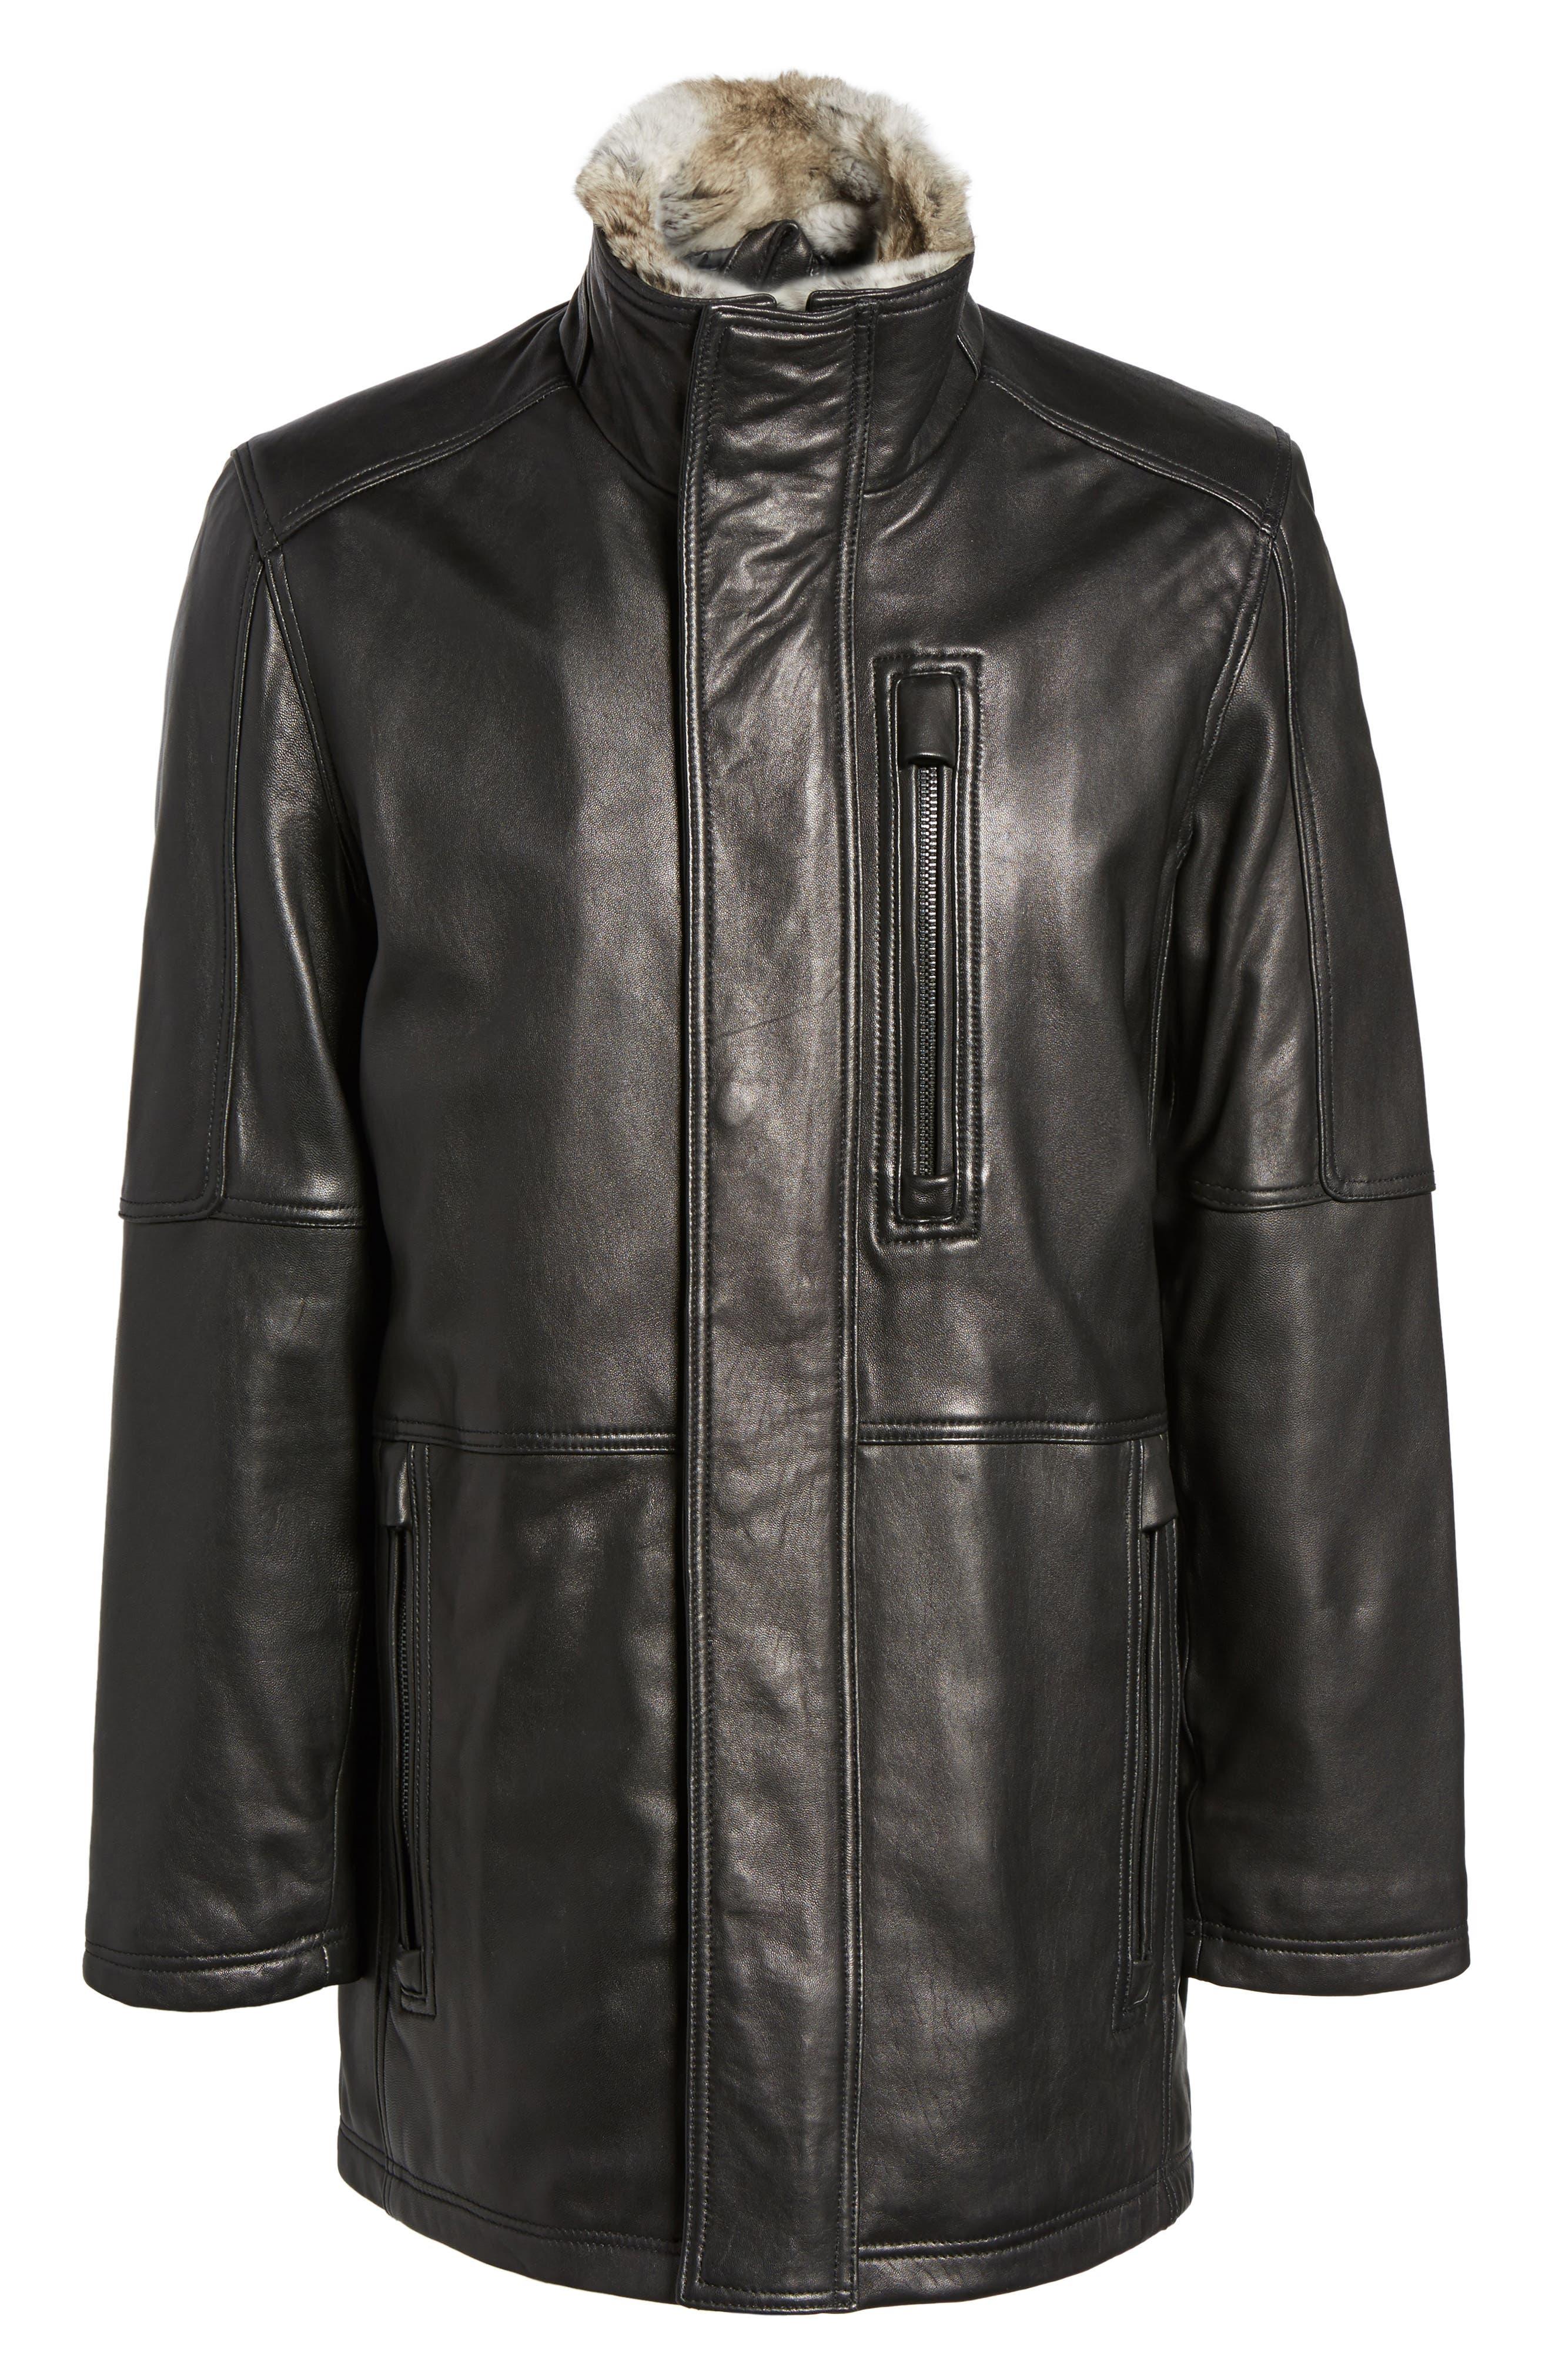 Middlebury Leather Car Coat with Genuine Rabbit Fur Trim,                             Alternate thumbnail 6, color,                             001